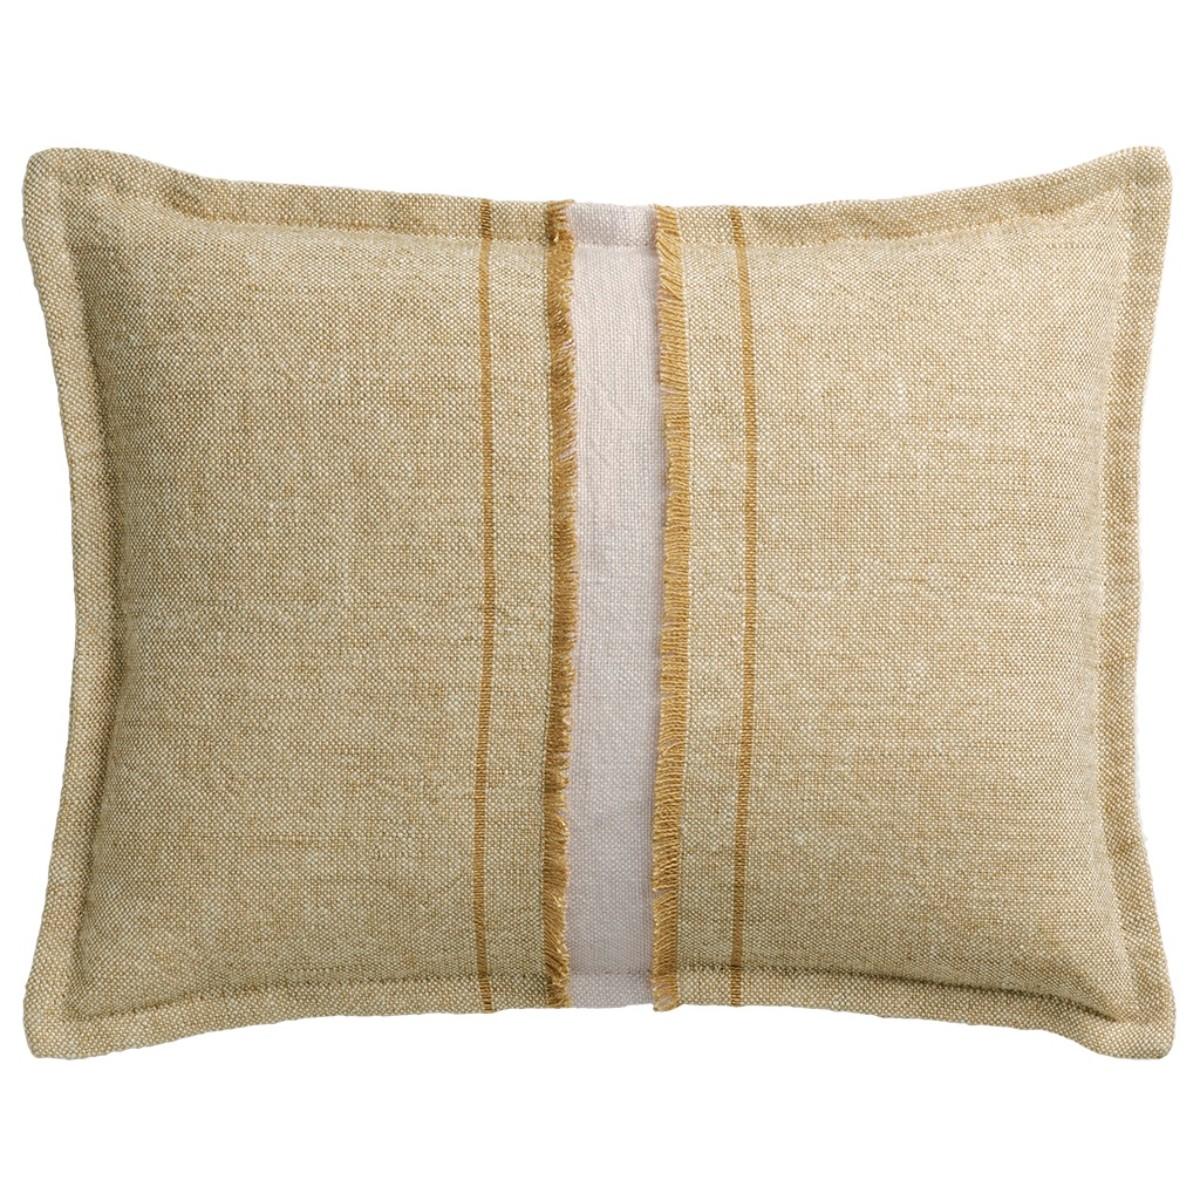 de Le Cuona | Haiku Cushion With Fringe Detail Straw